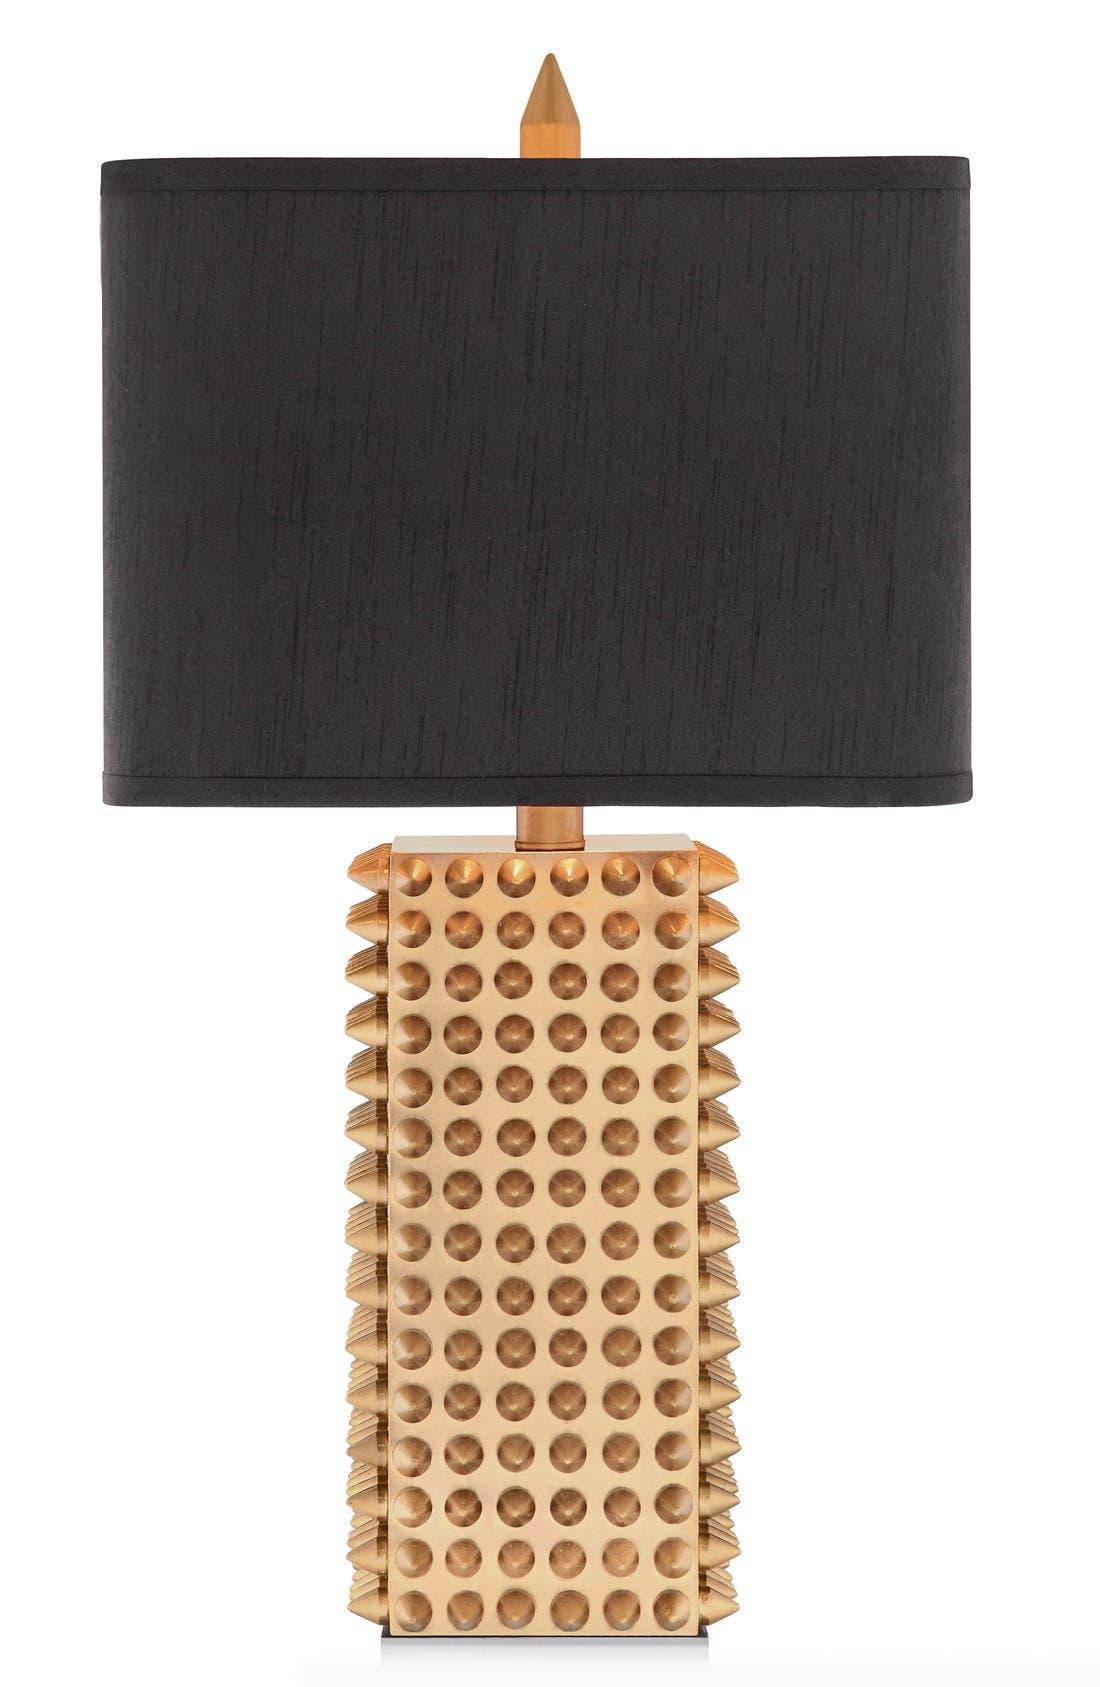 JAlexander Lighting Goldtone Spiked Square Table Lamp